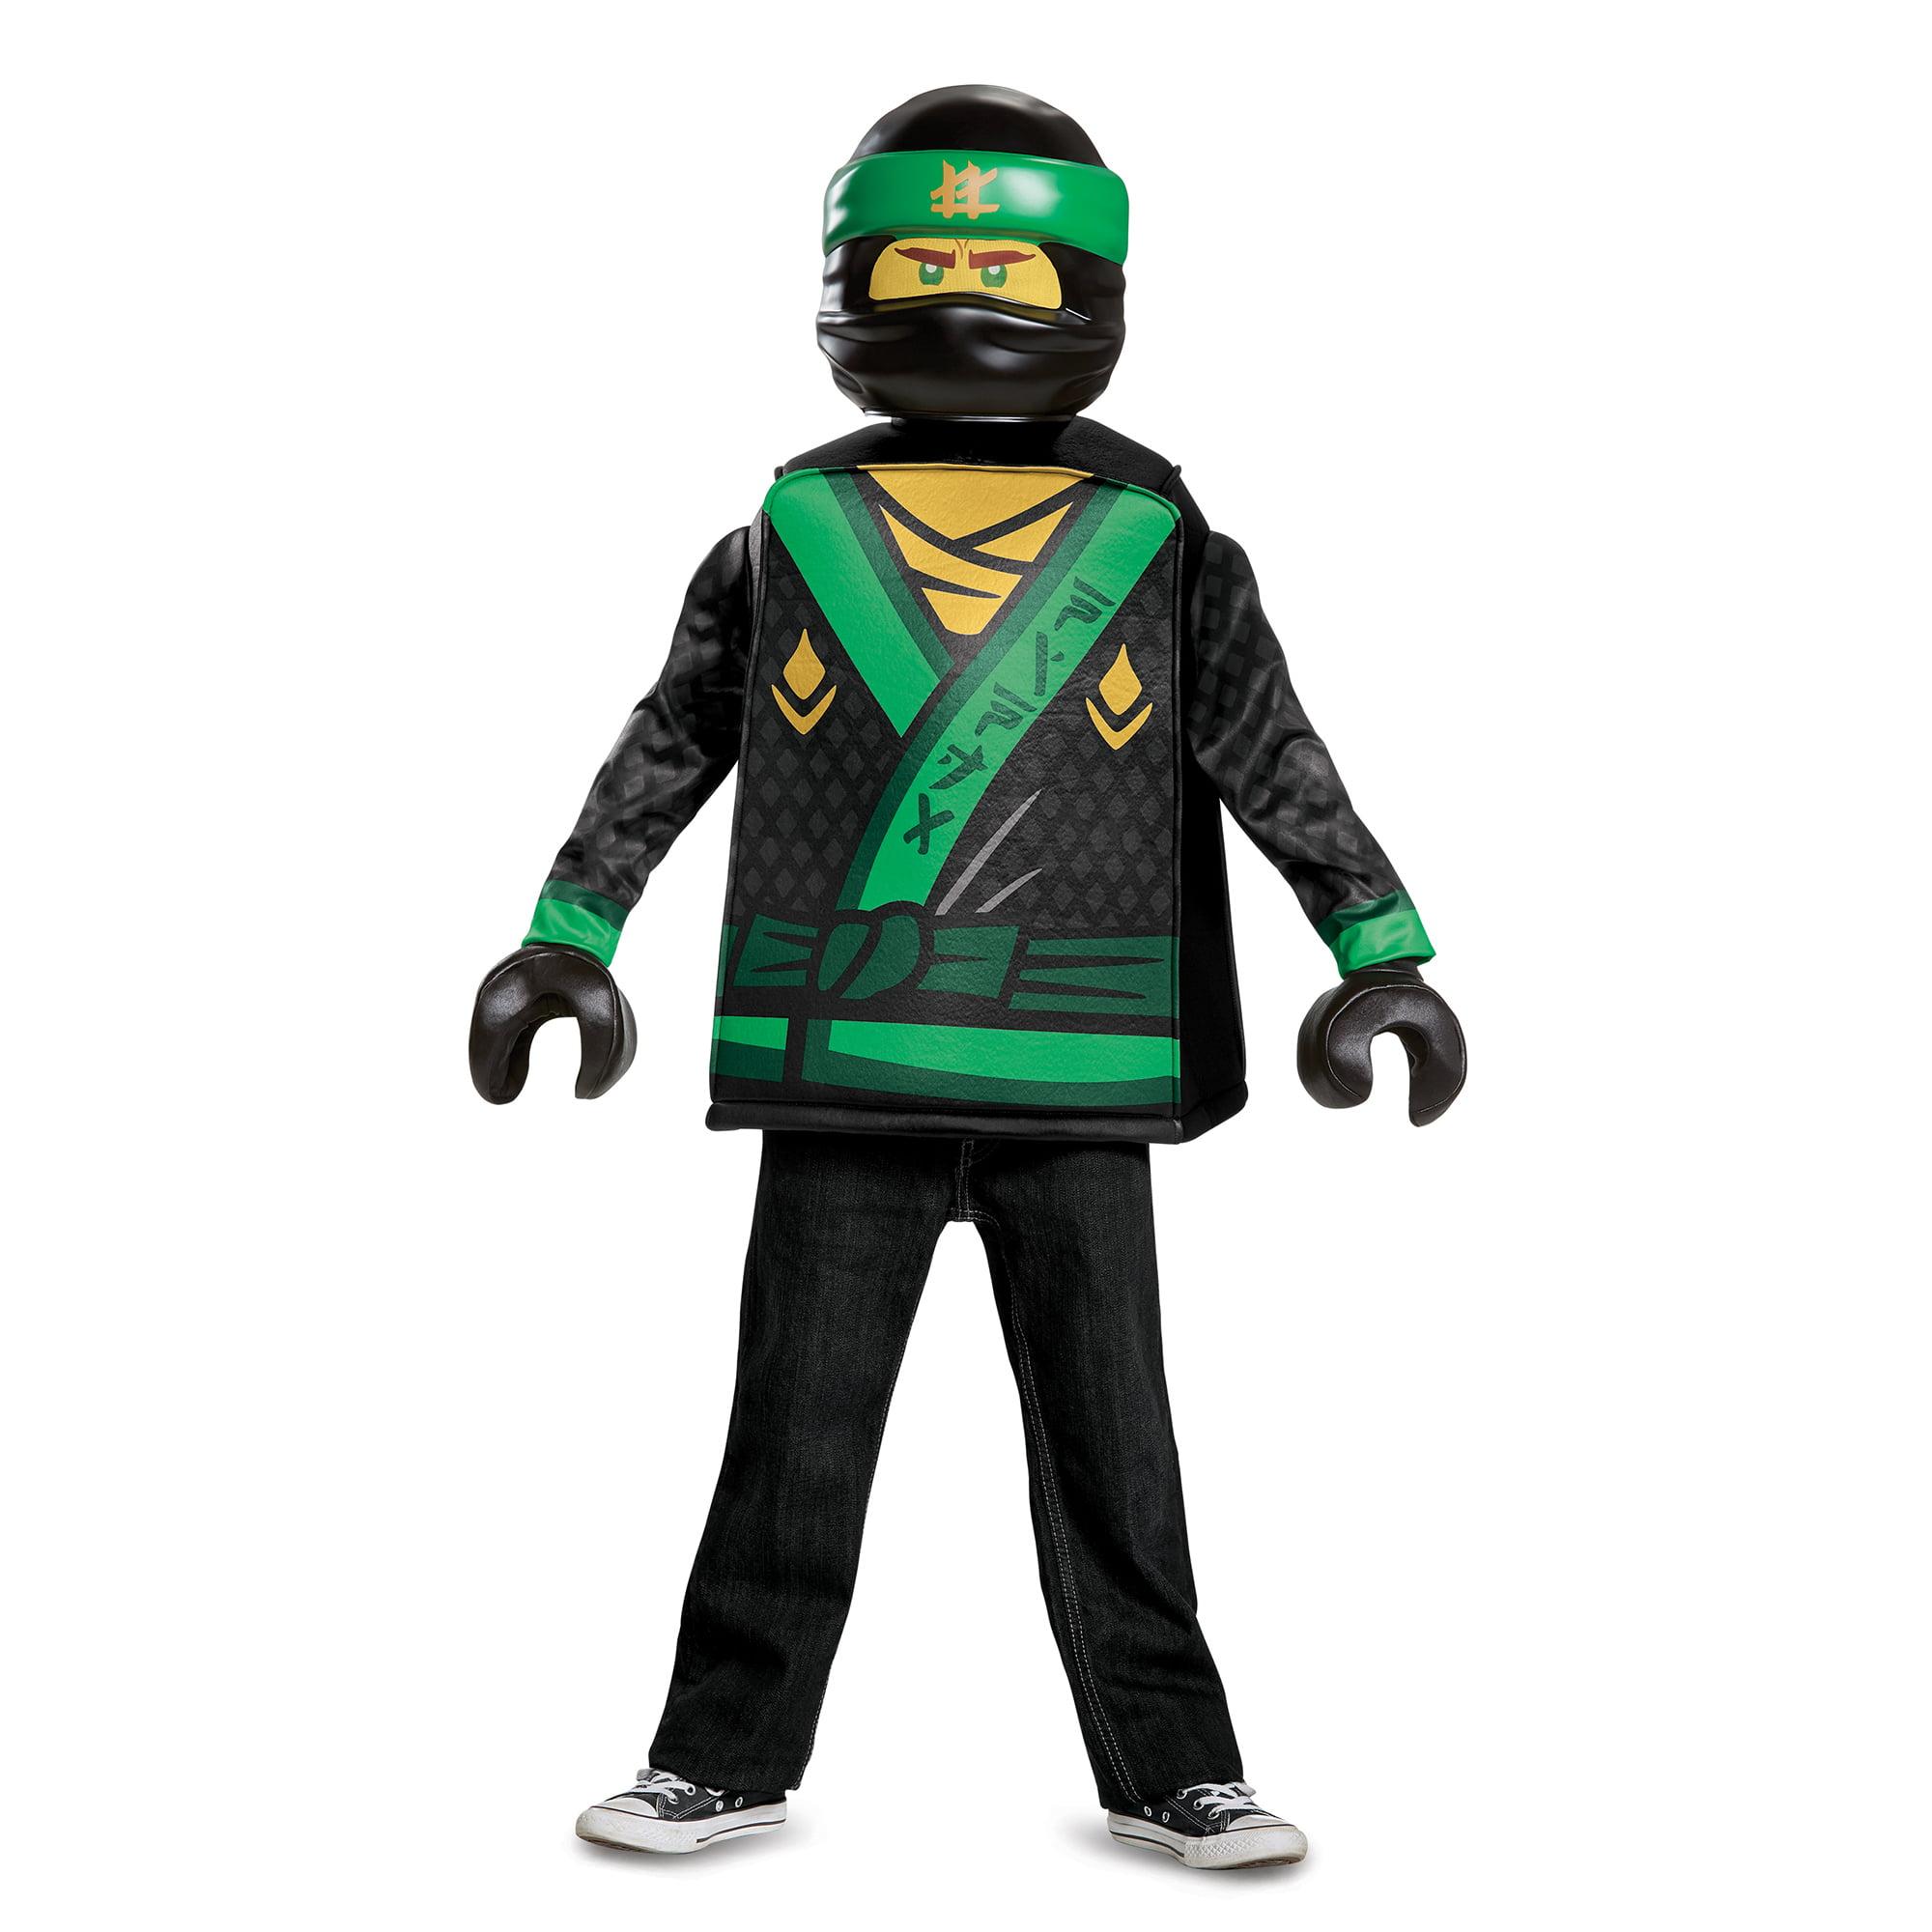 Lego Ninjago Boys' Lloyd Movie Classic Costume